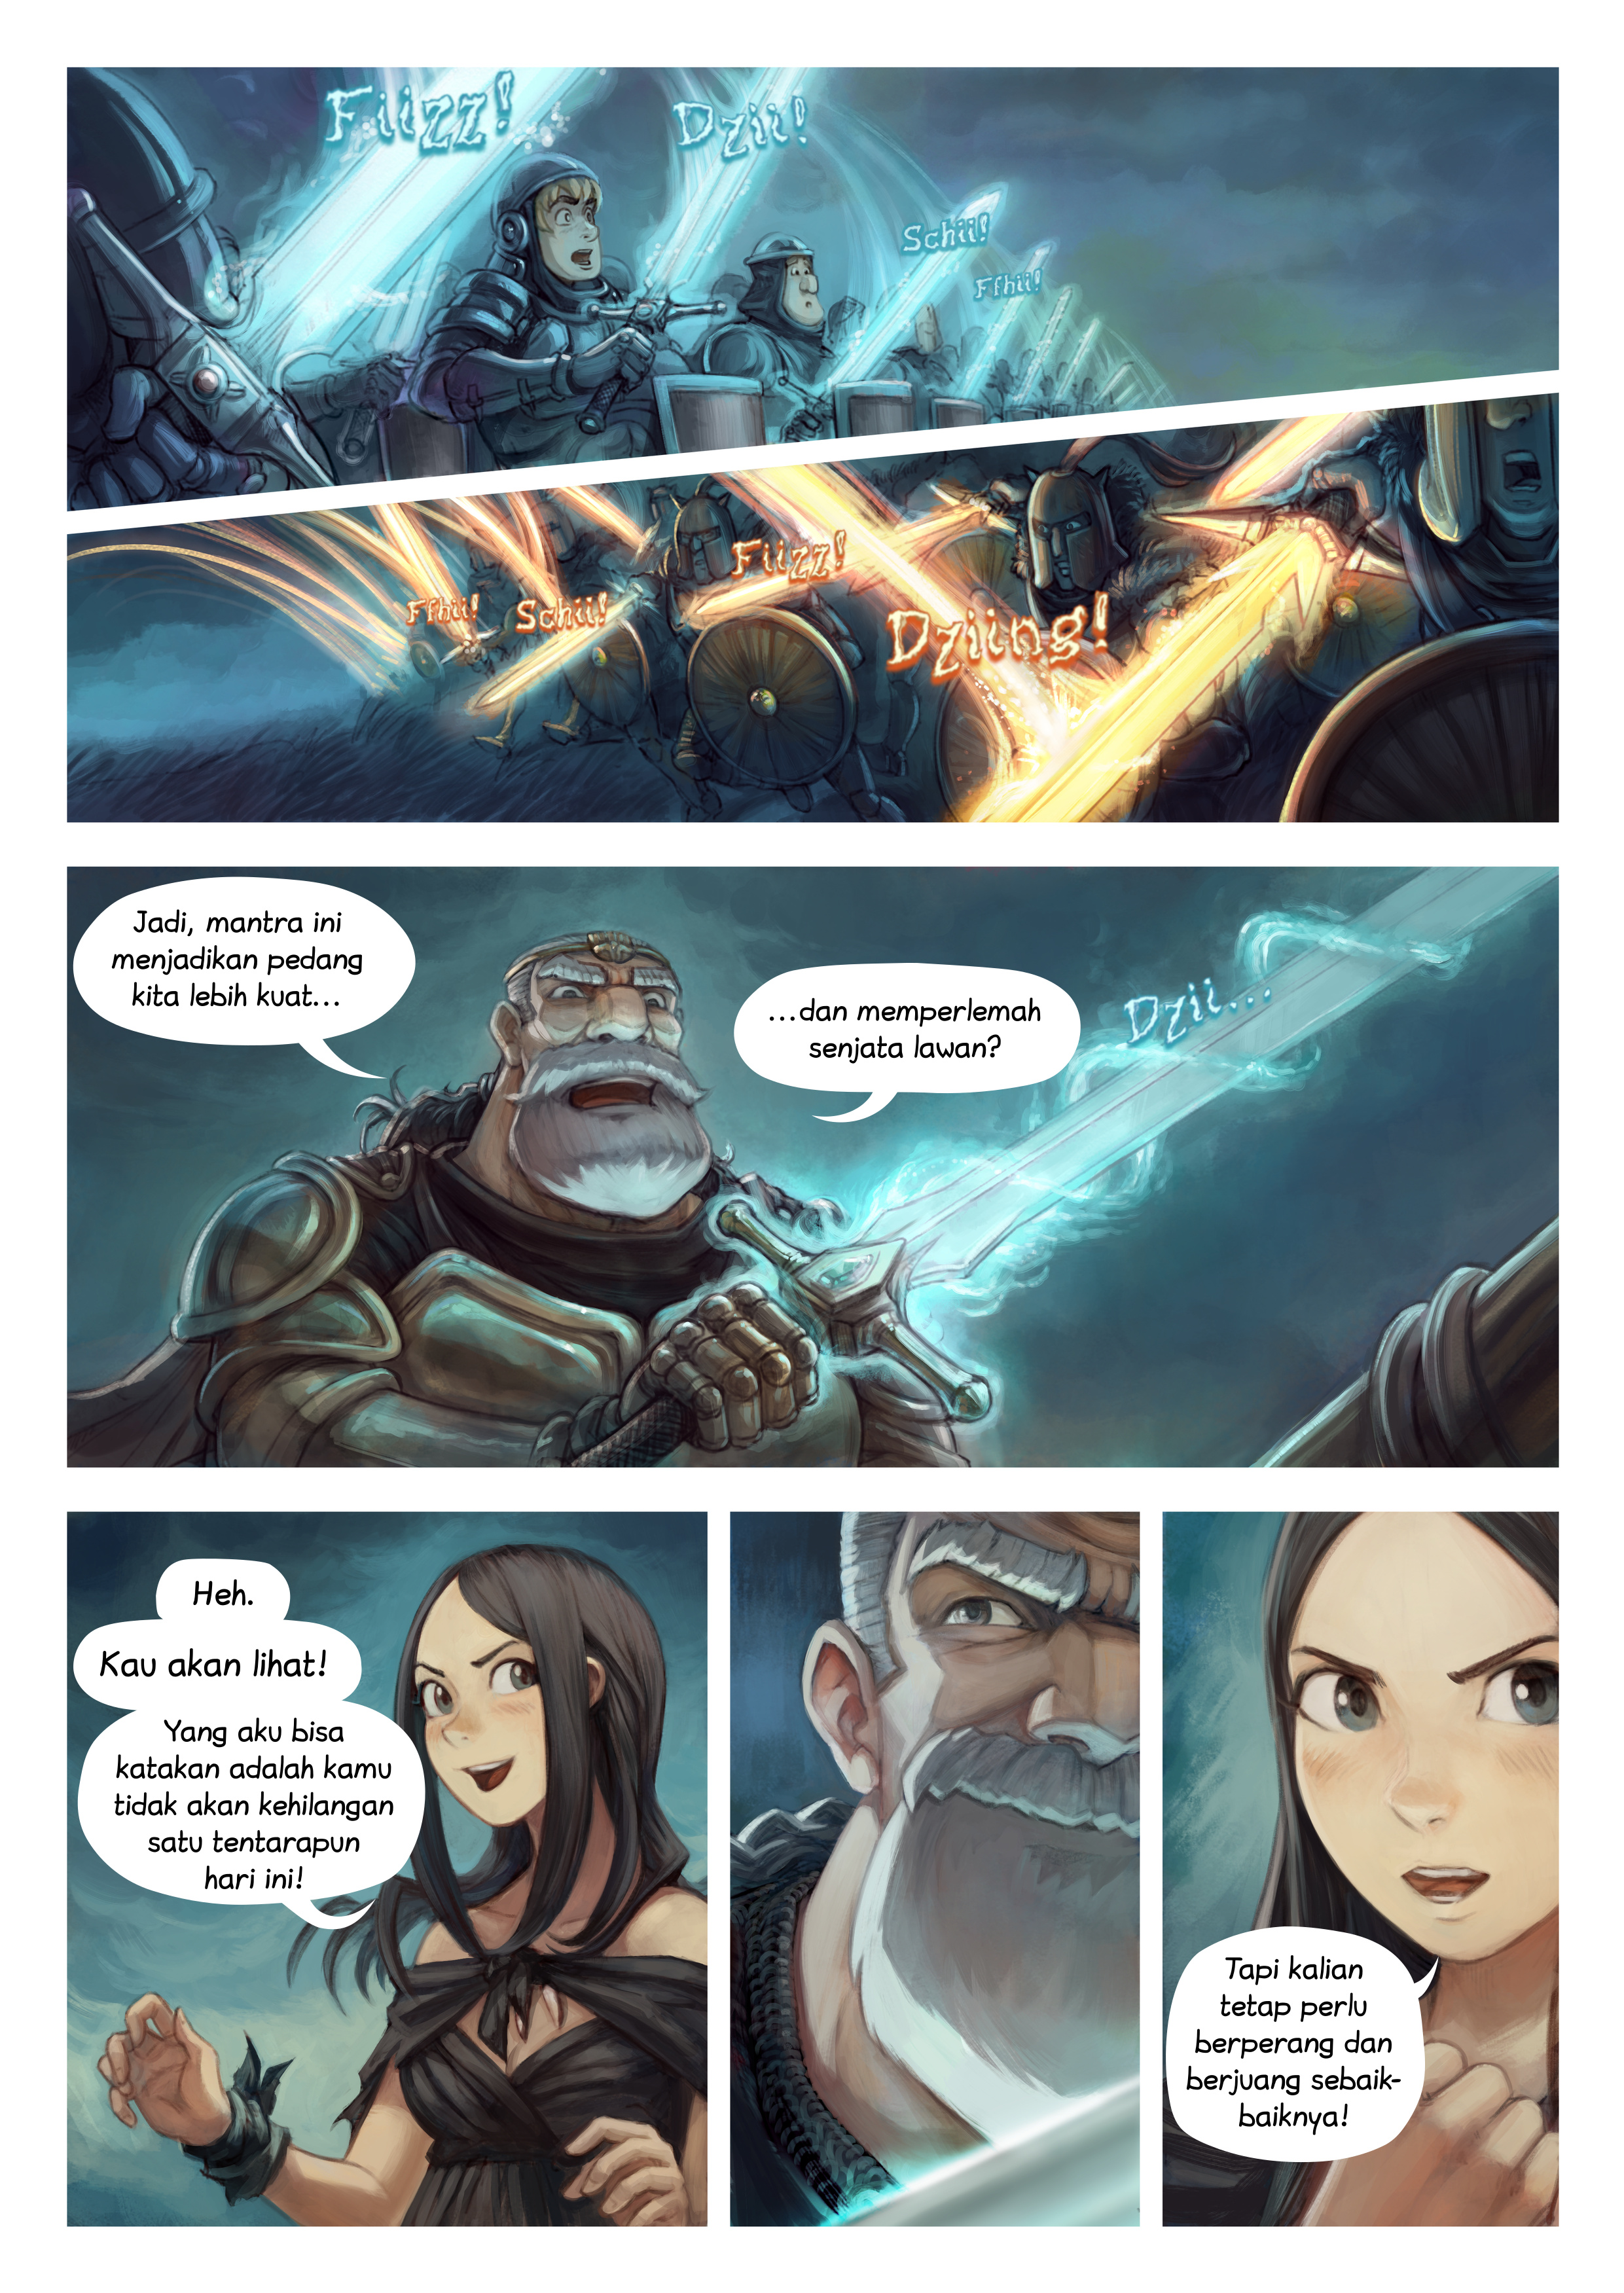 Episode 33: Mantra Perang, Page 3